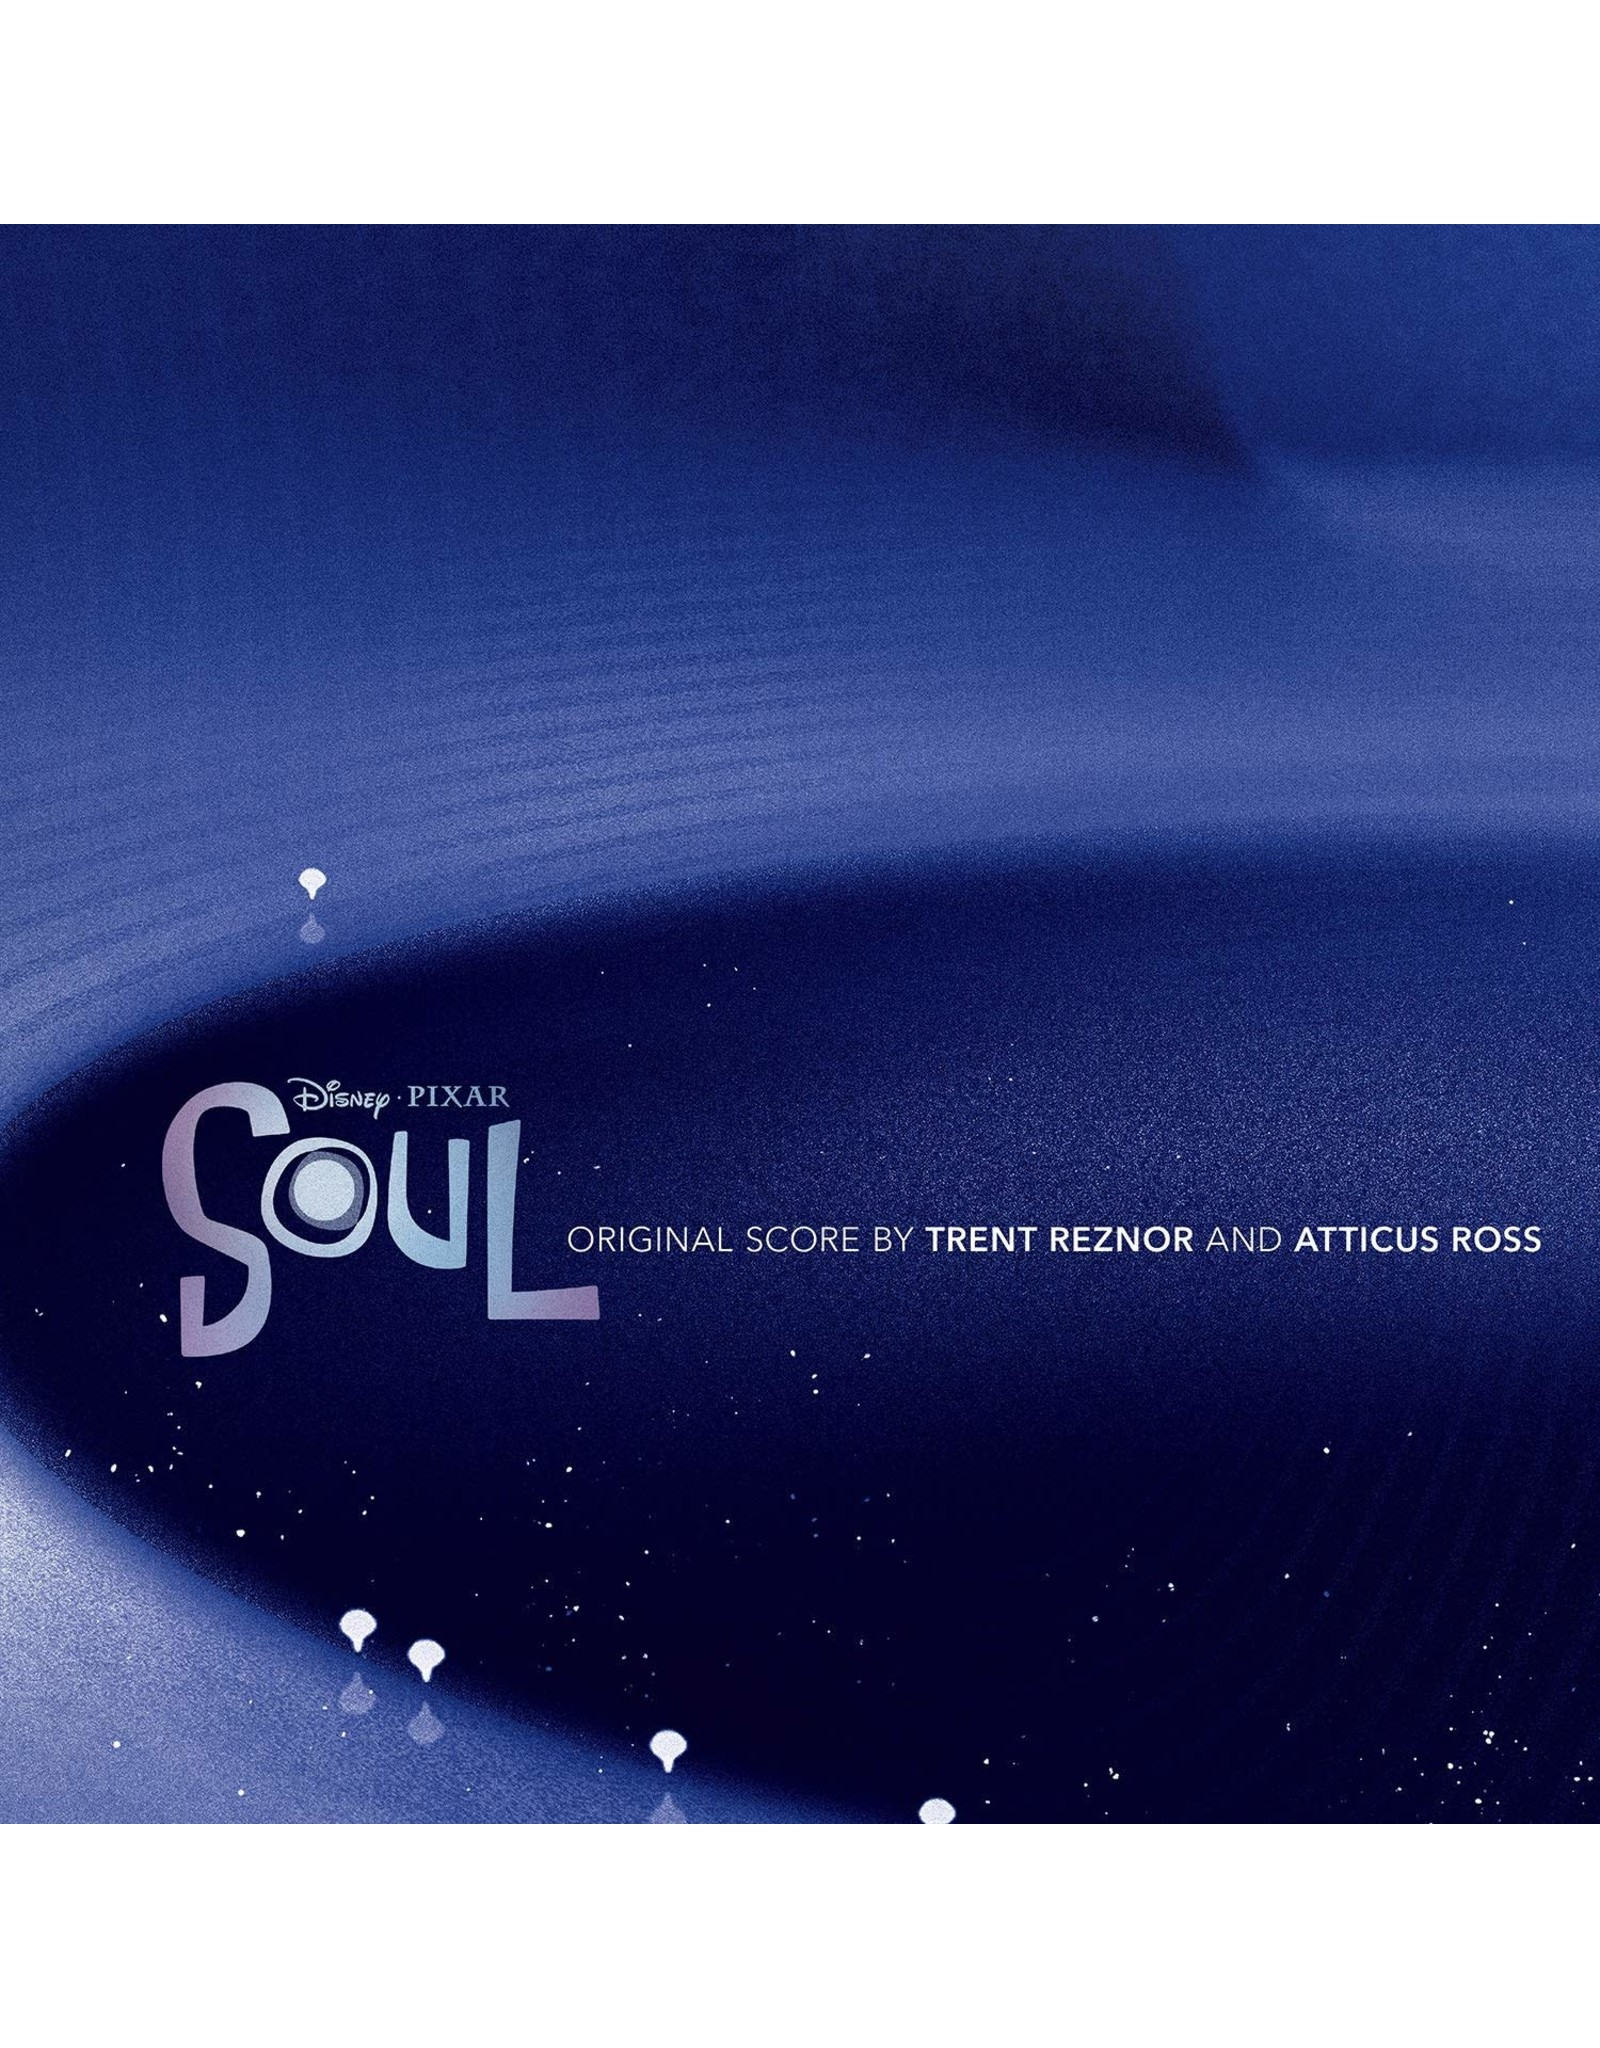 Reznor, Trent & Atticus Ross - Soul (Original Soundtrack) LP